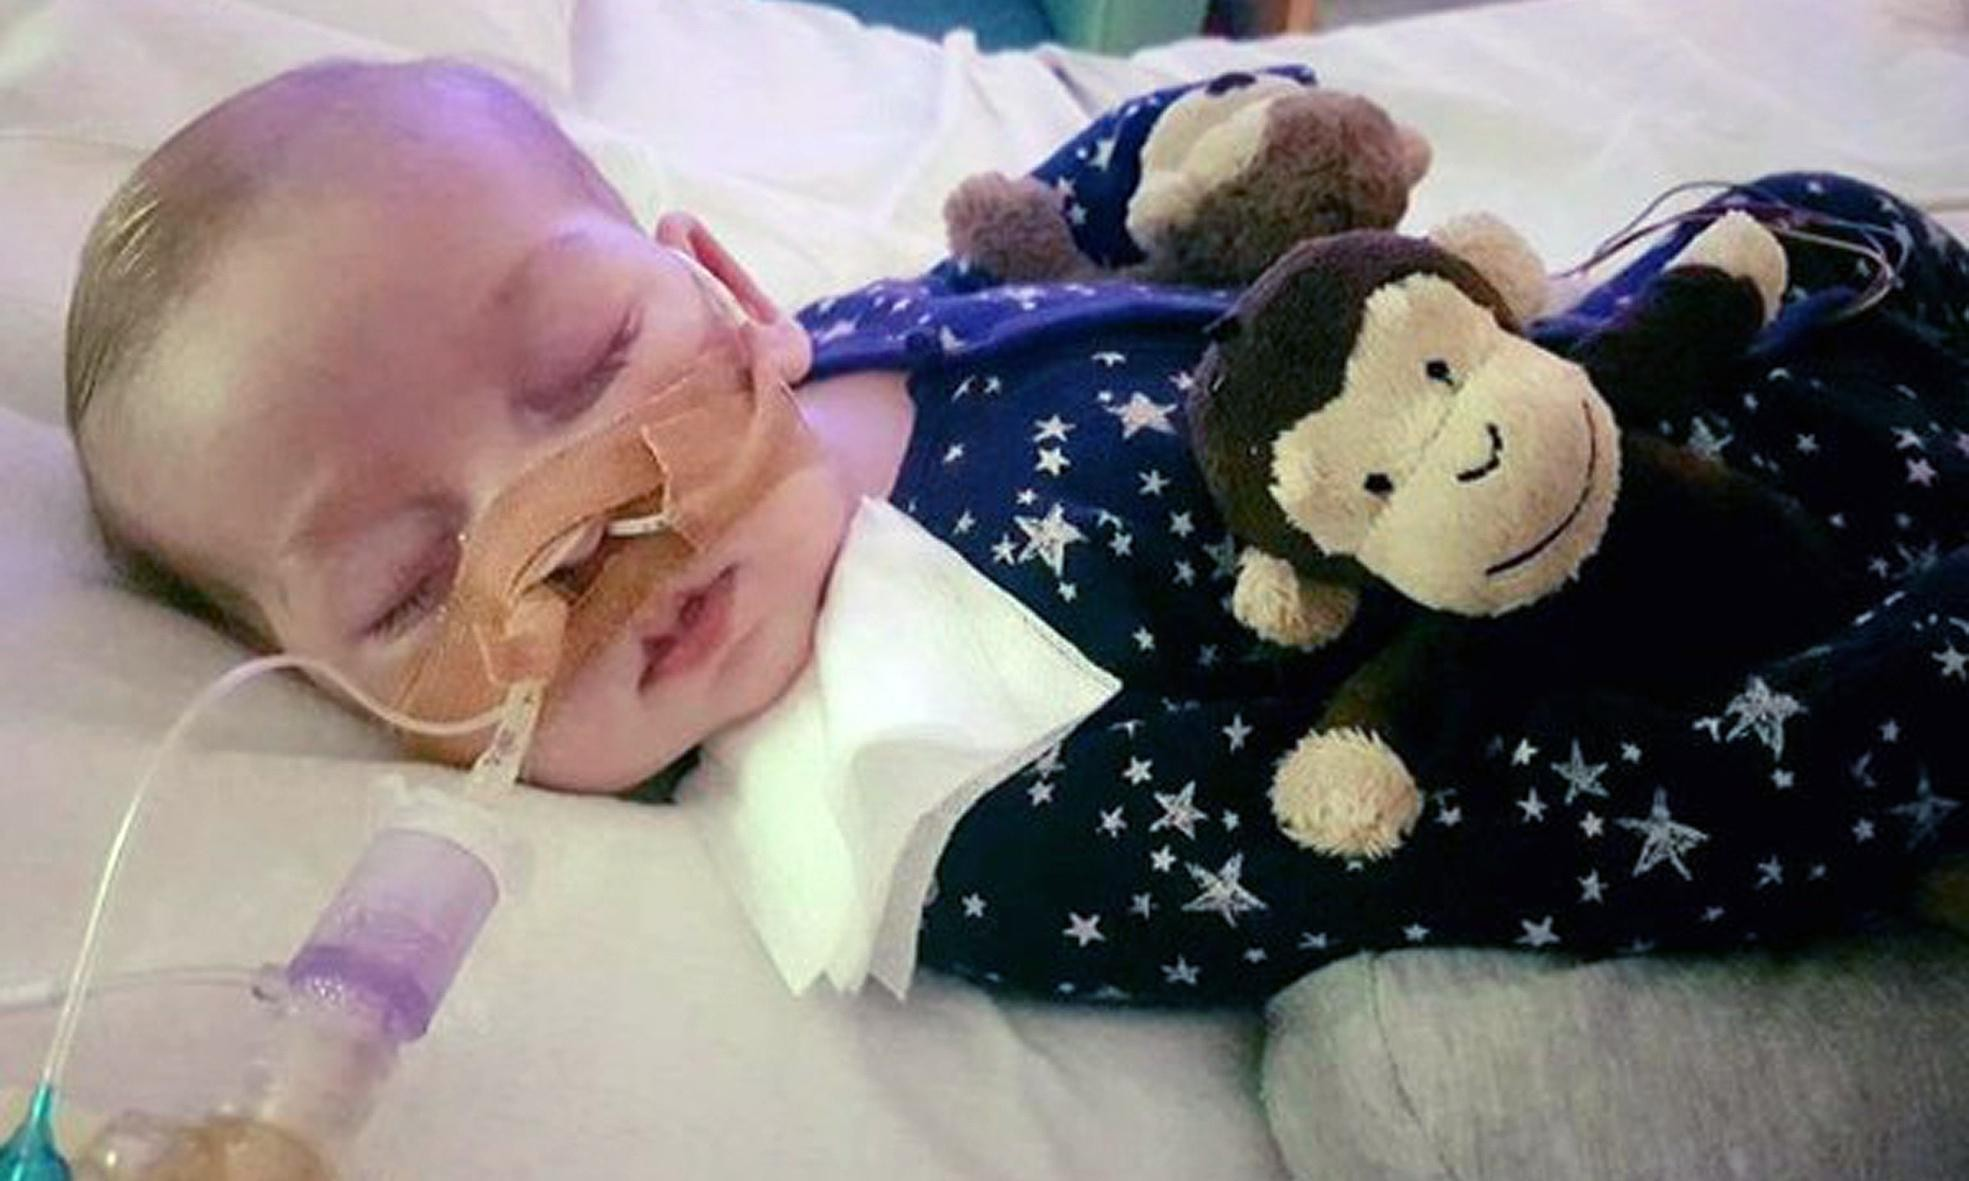 Charlie Gard's parents say their 'beautiful boy' has died